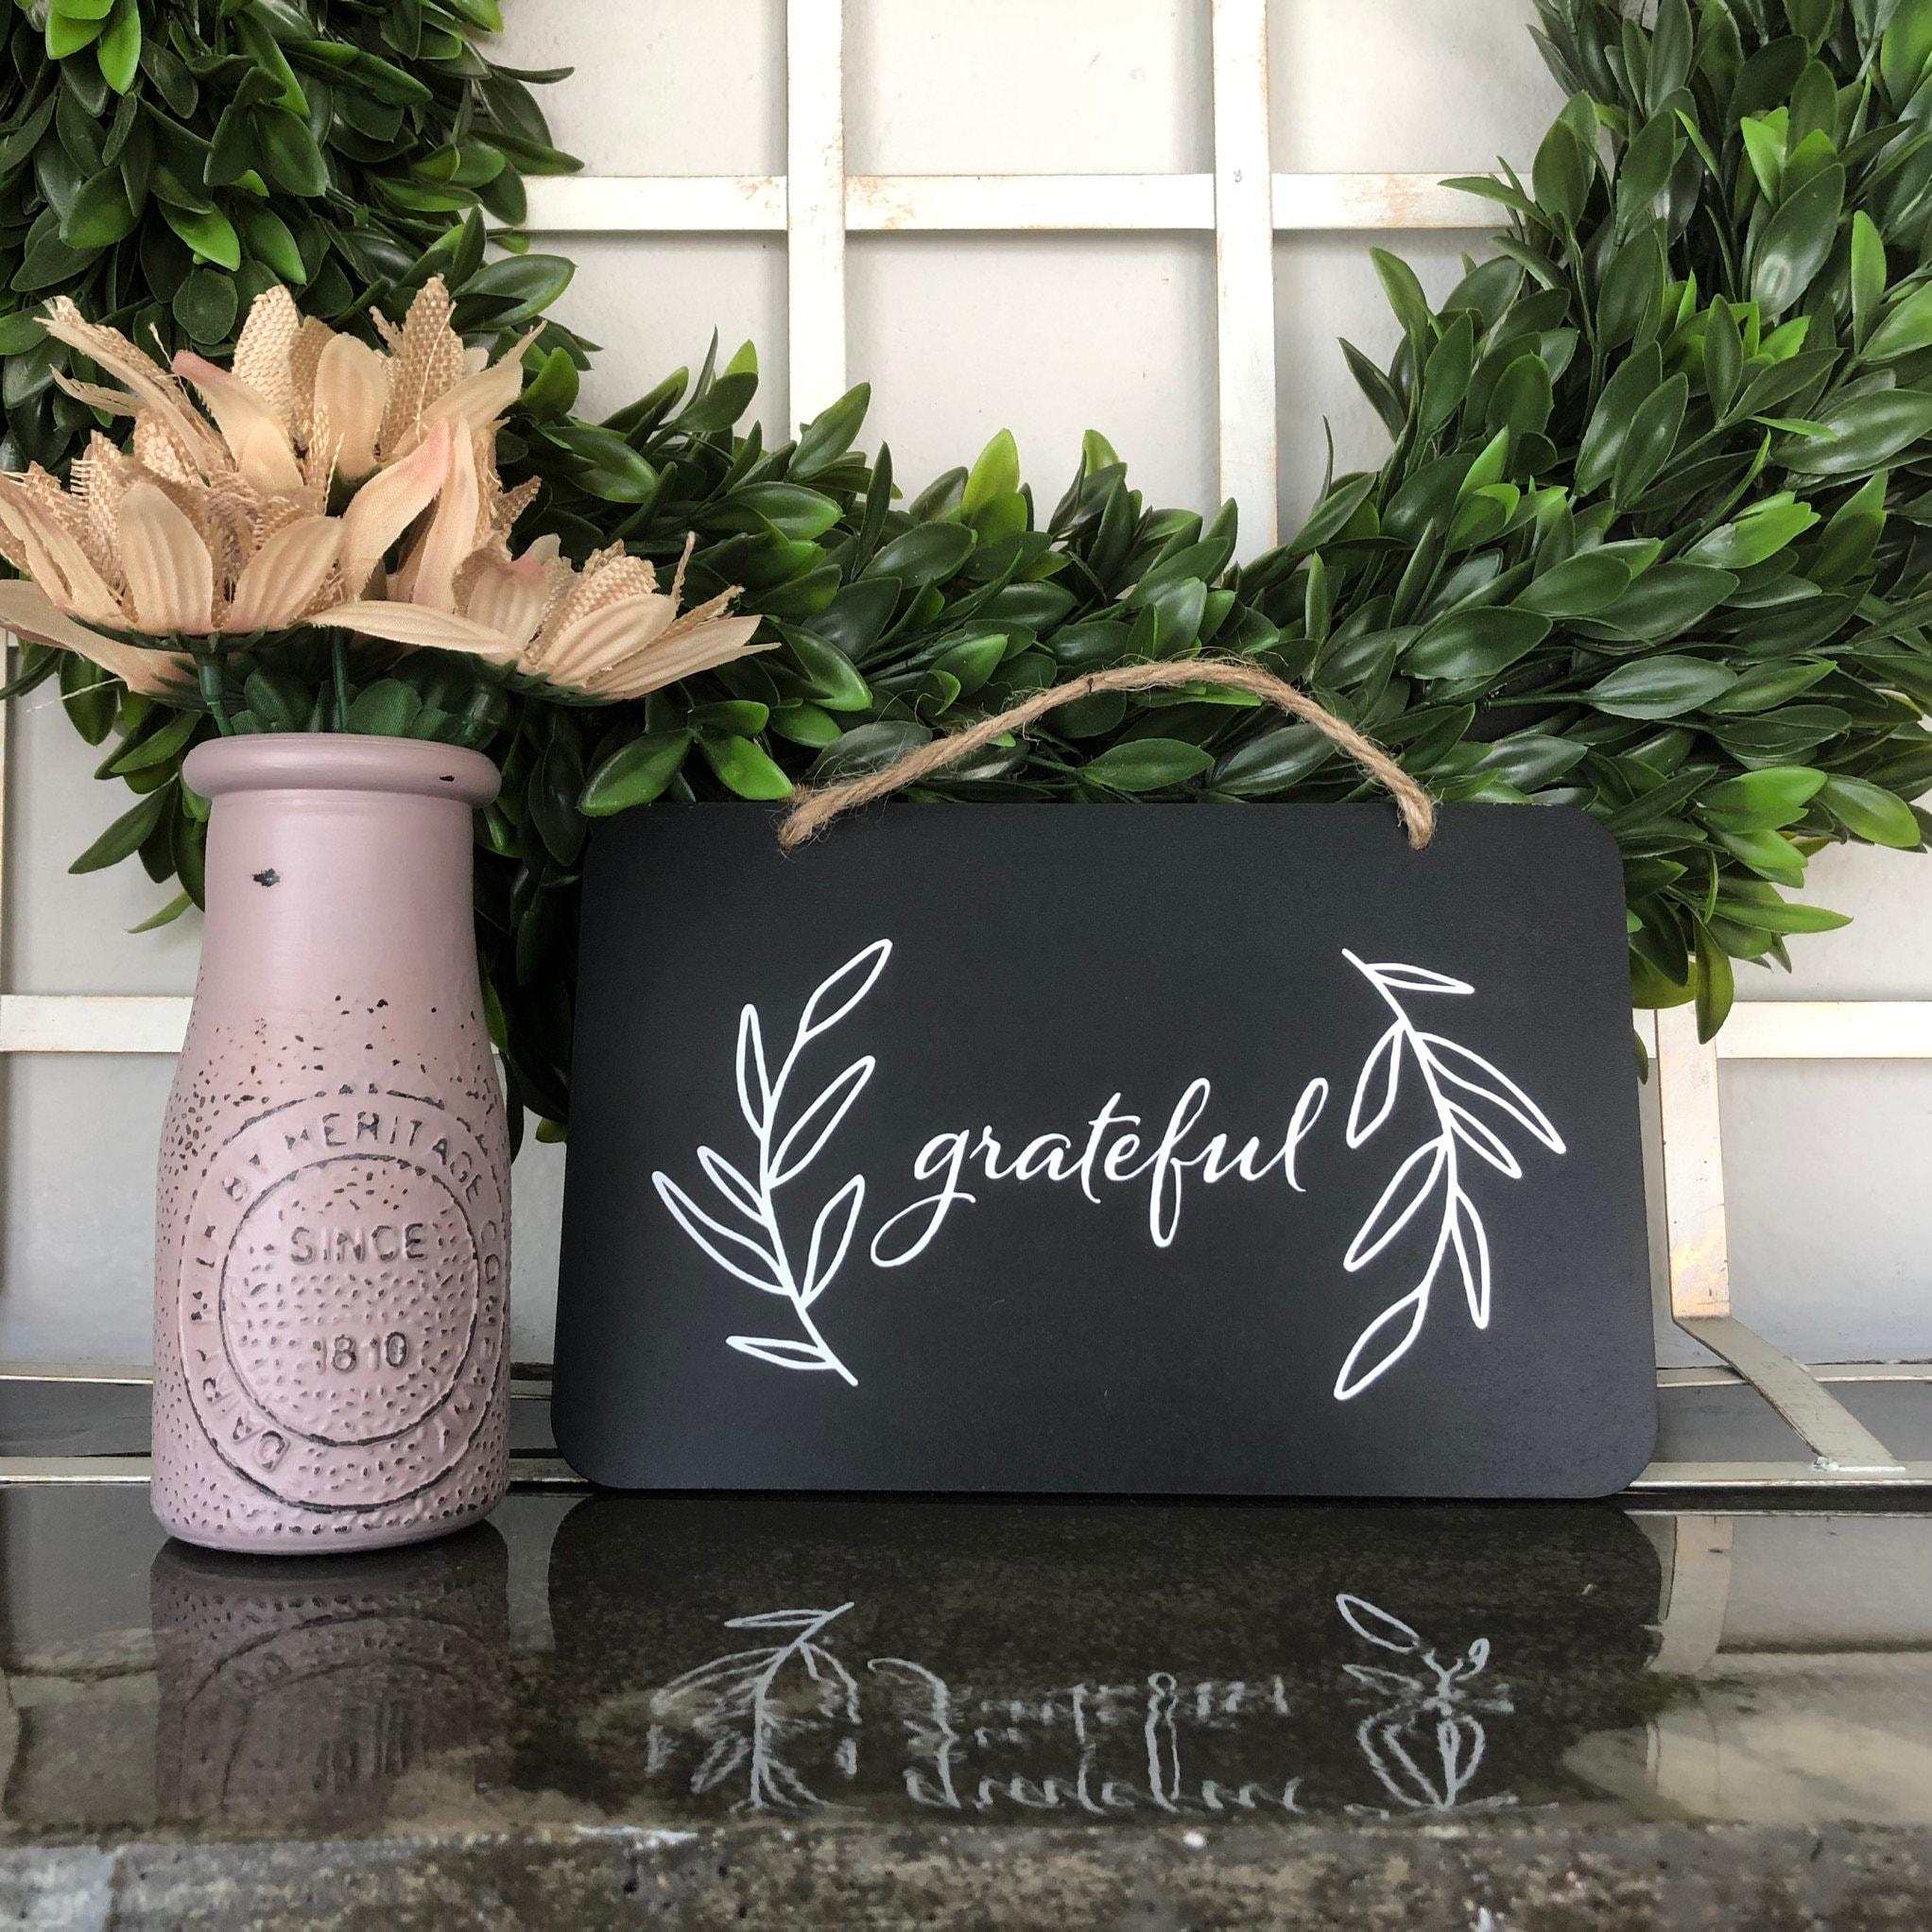 Grateful Chalkboard Style Black White Sign Fall Decor